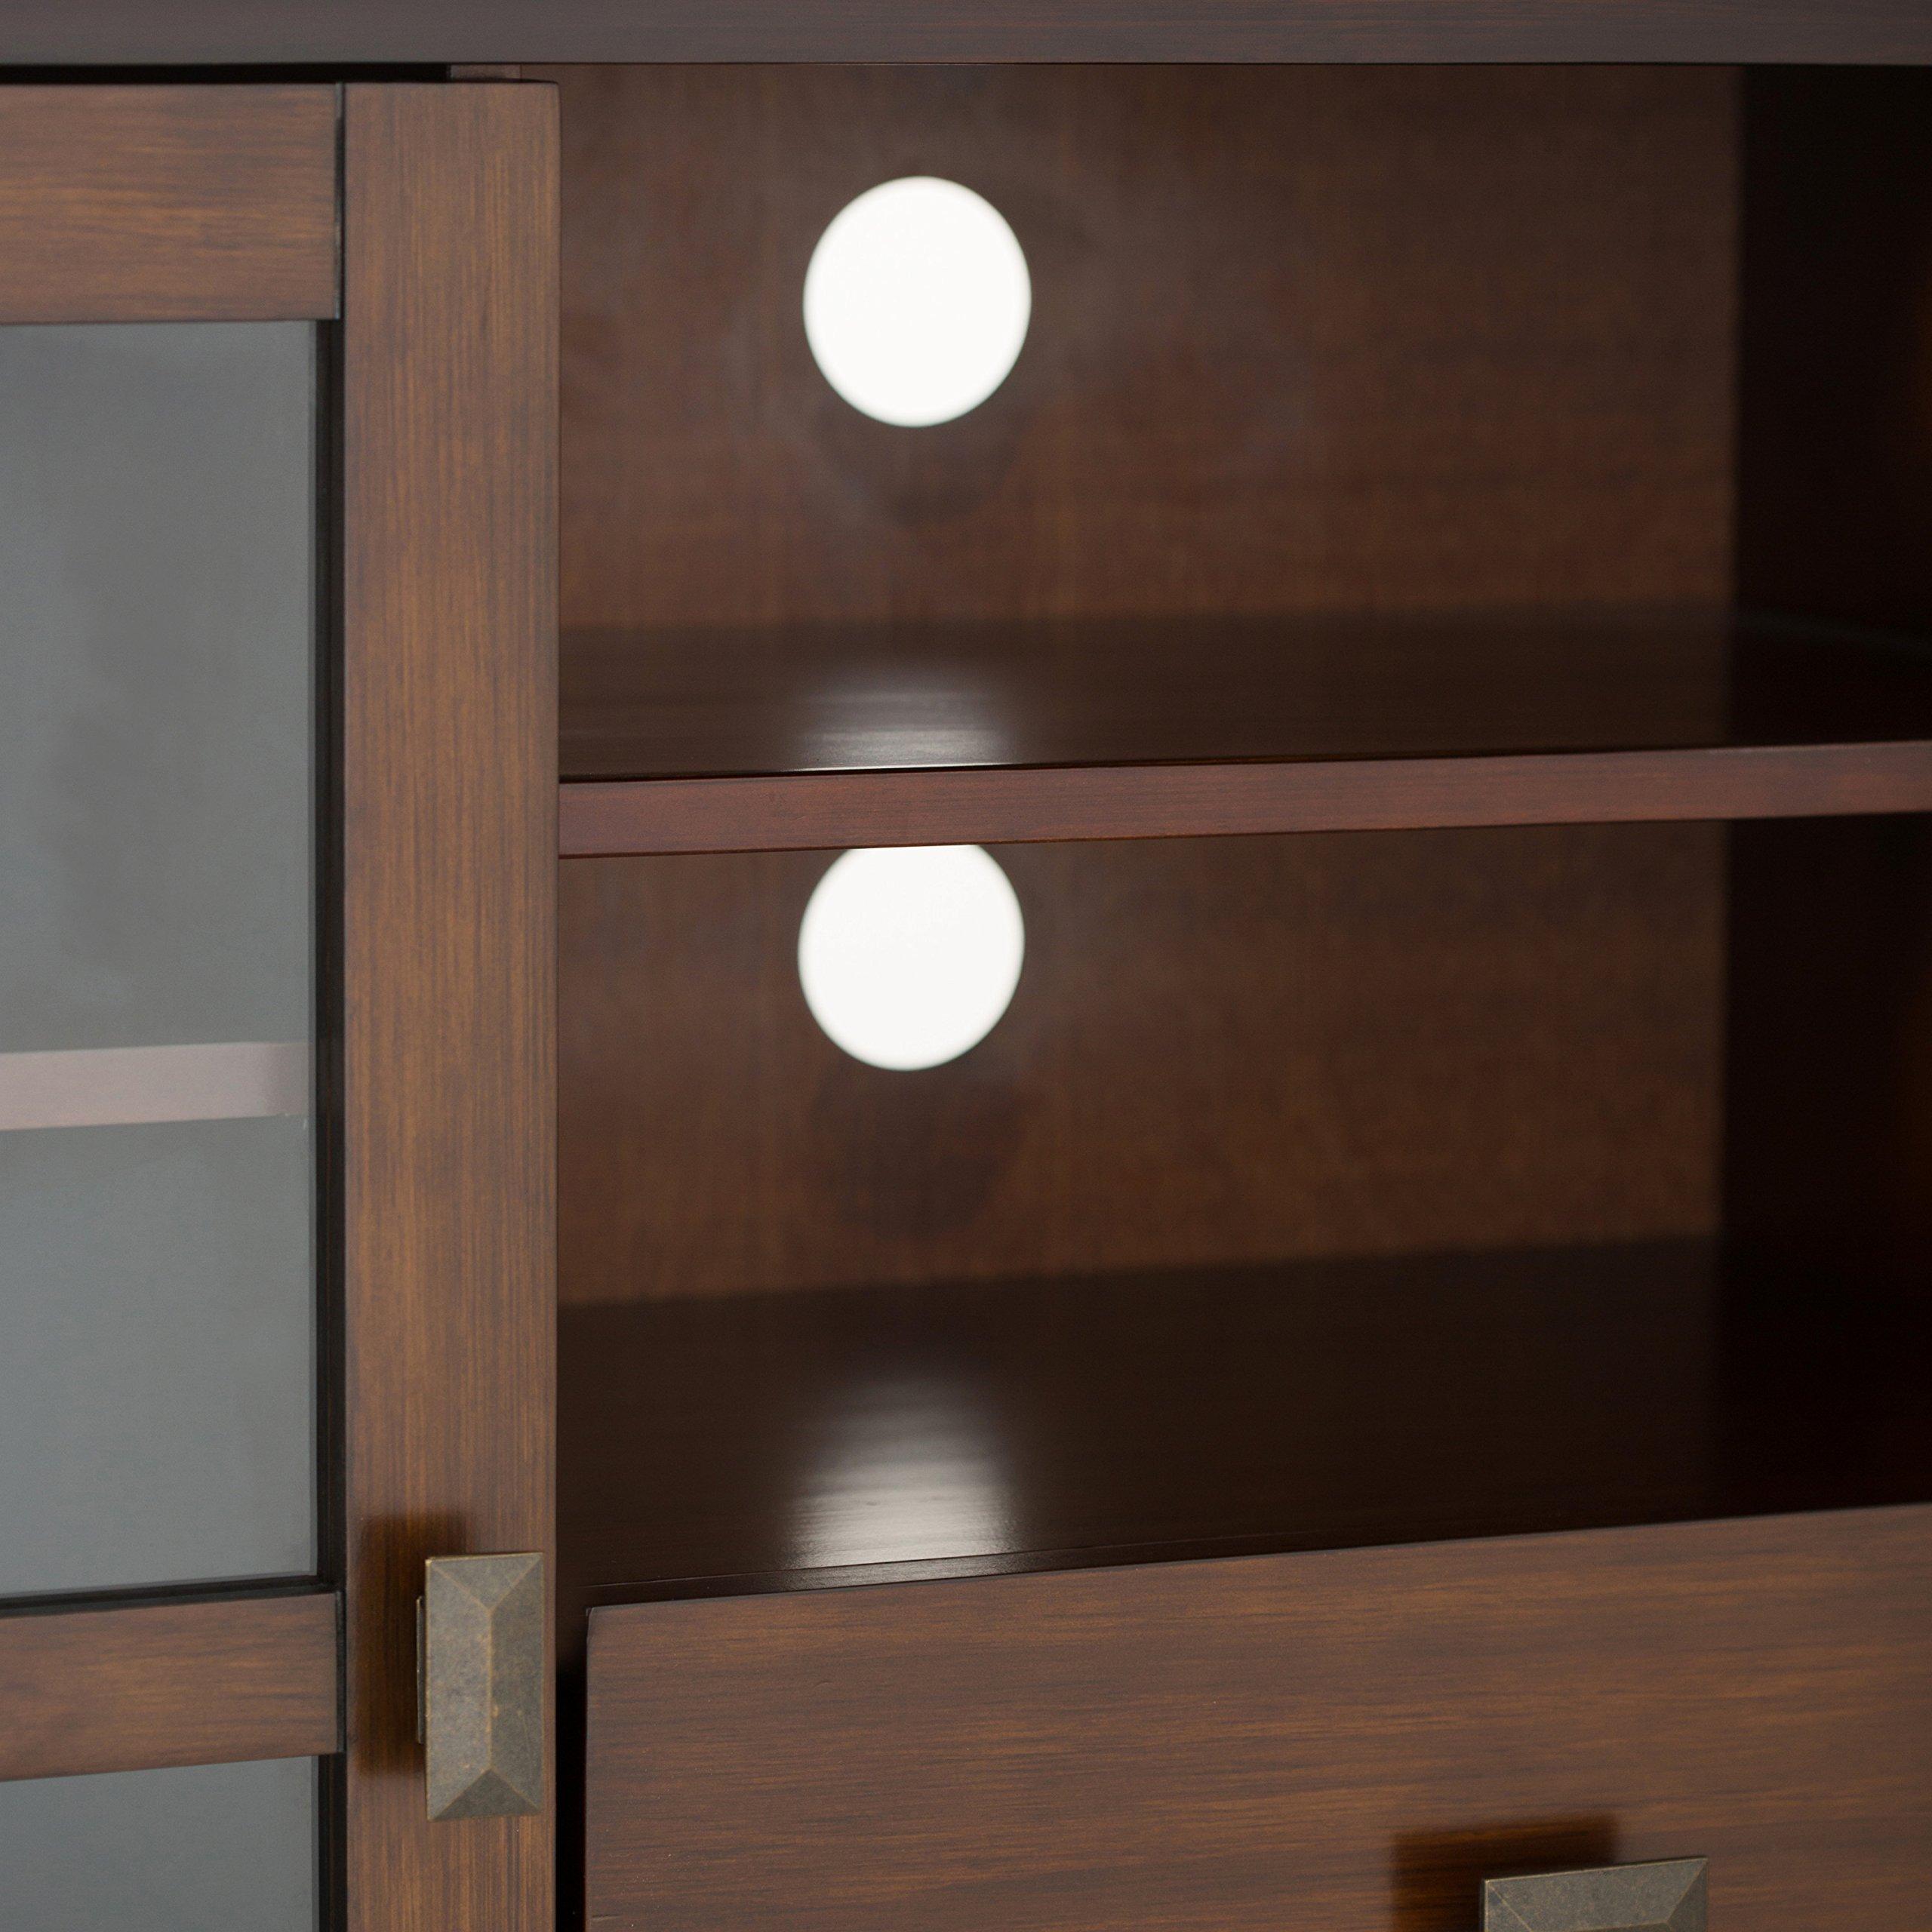 Simpli Home Artisan TV Media Stand for TVs up to 60'', Medium Auburn Brown by Simpli Home (Image #4)